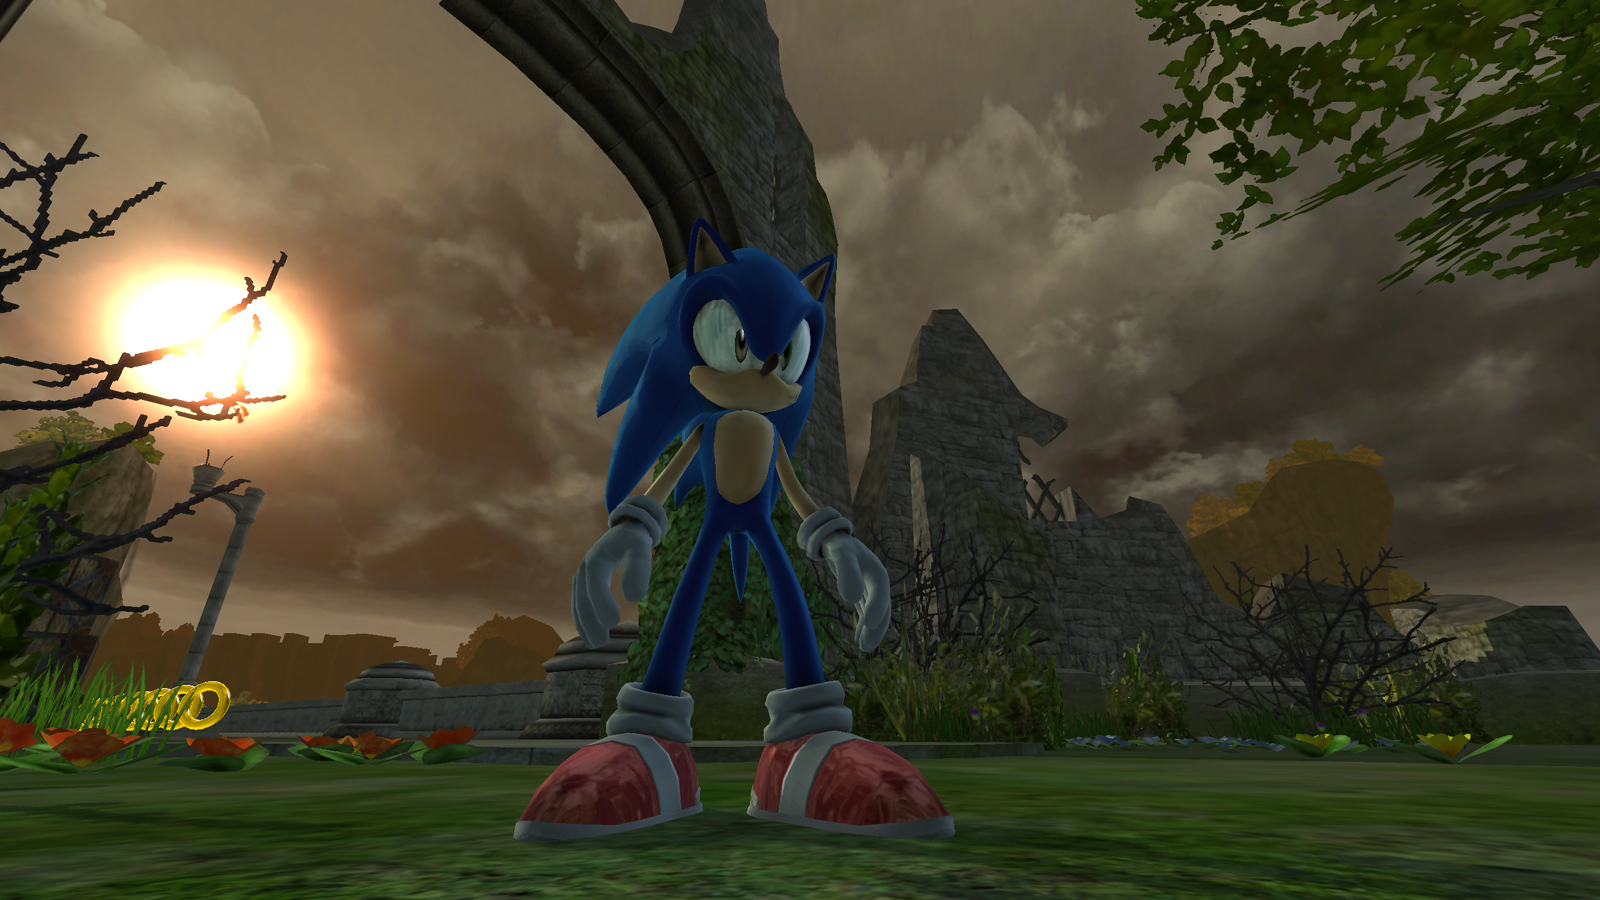 File:Sonic06screen33.jpg